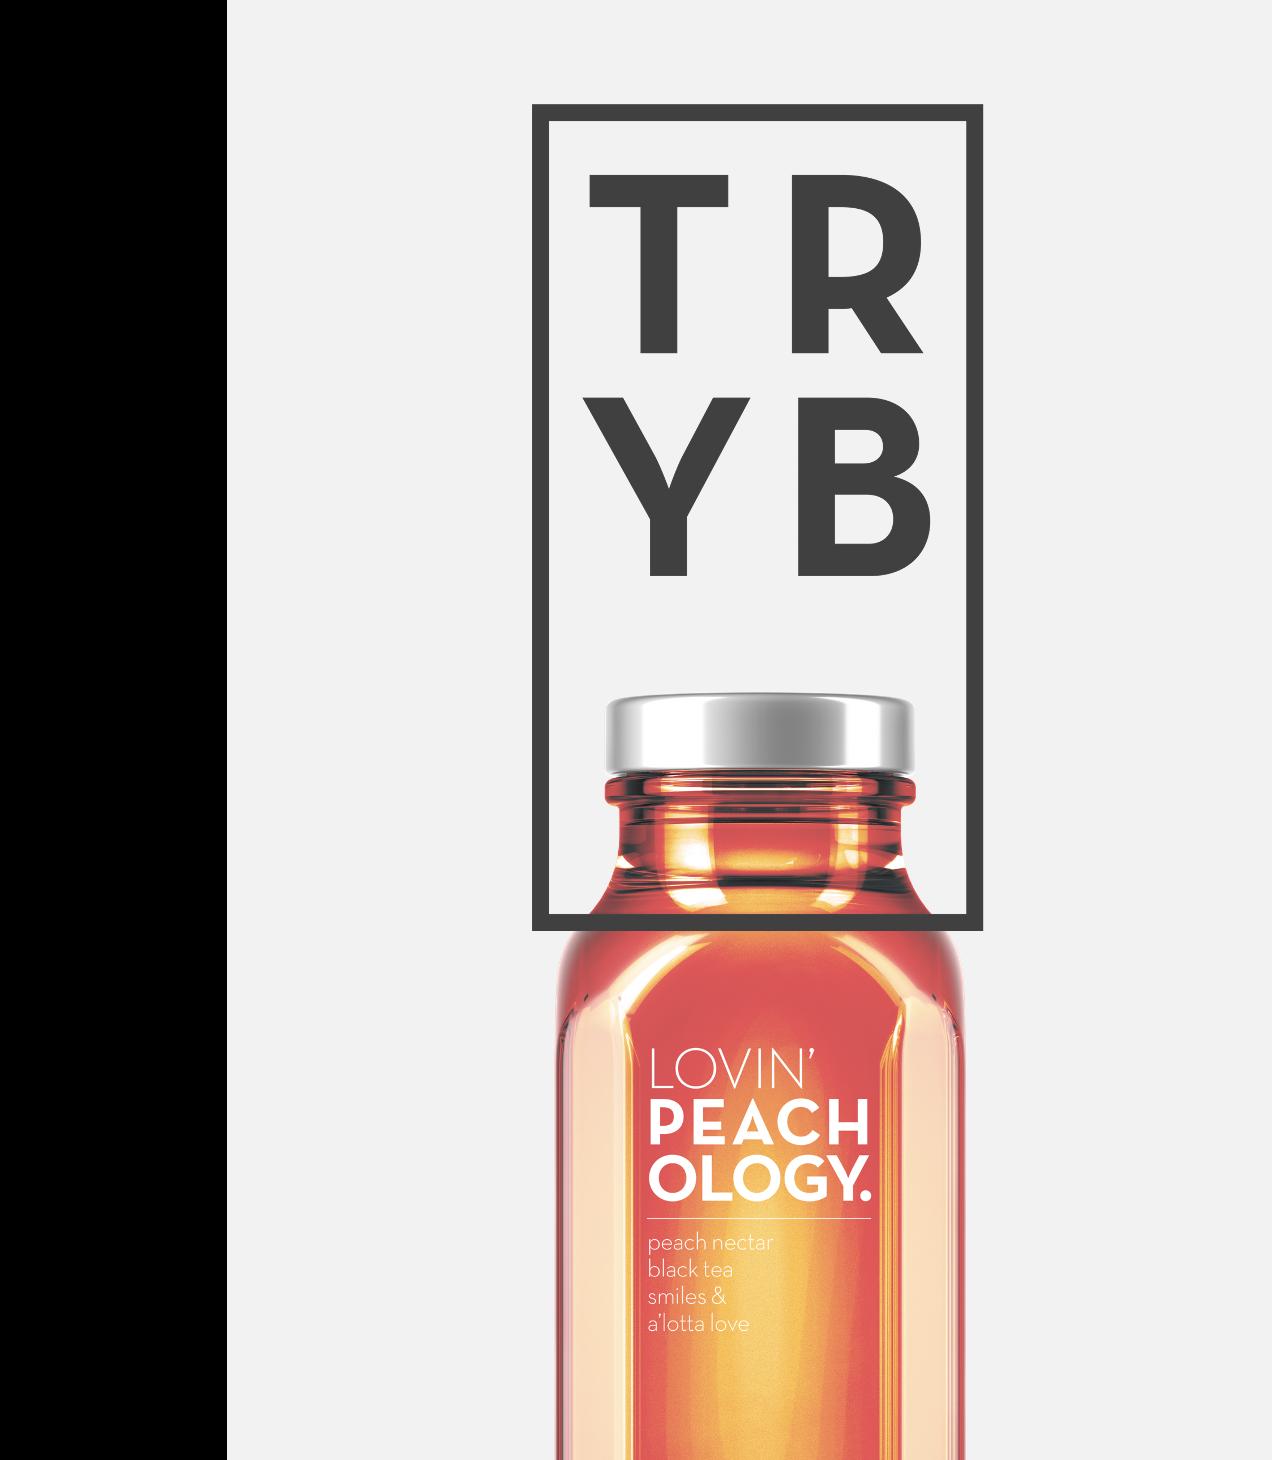 TRYB, Theme Park Lemonade, My Better Half & Half Tea, Peachology, Teas, Juices, Black Owned Business, Willoughby Avenue, Buy Black, Ross Johnson